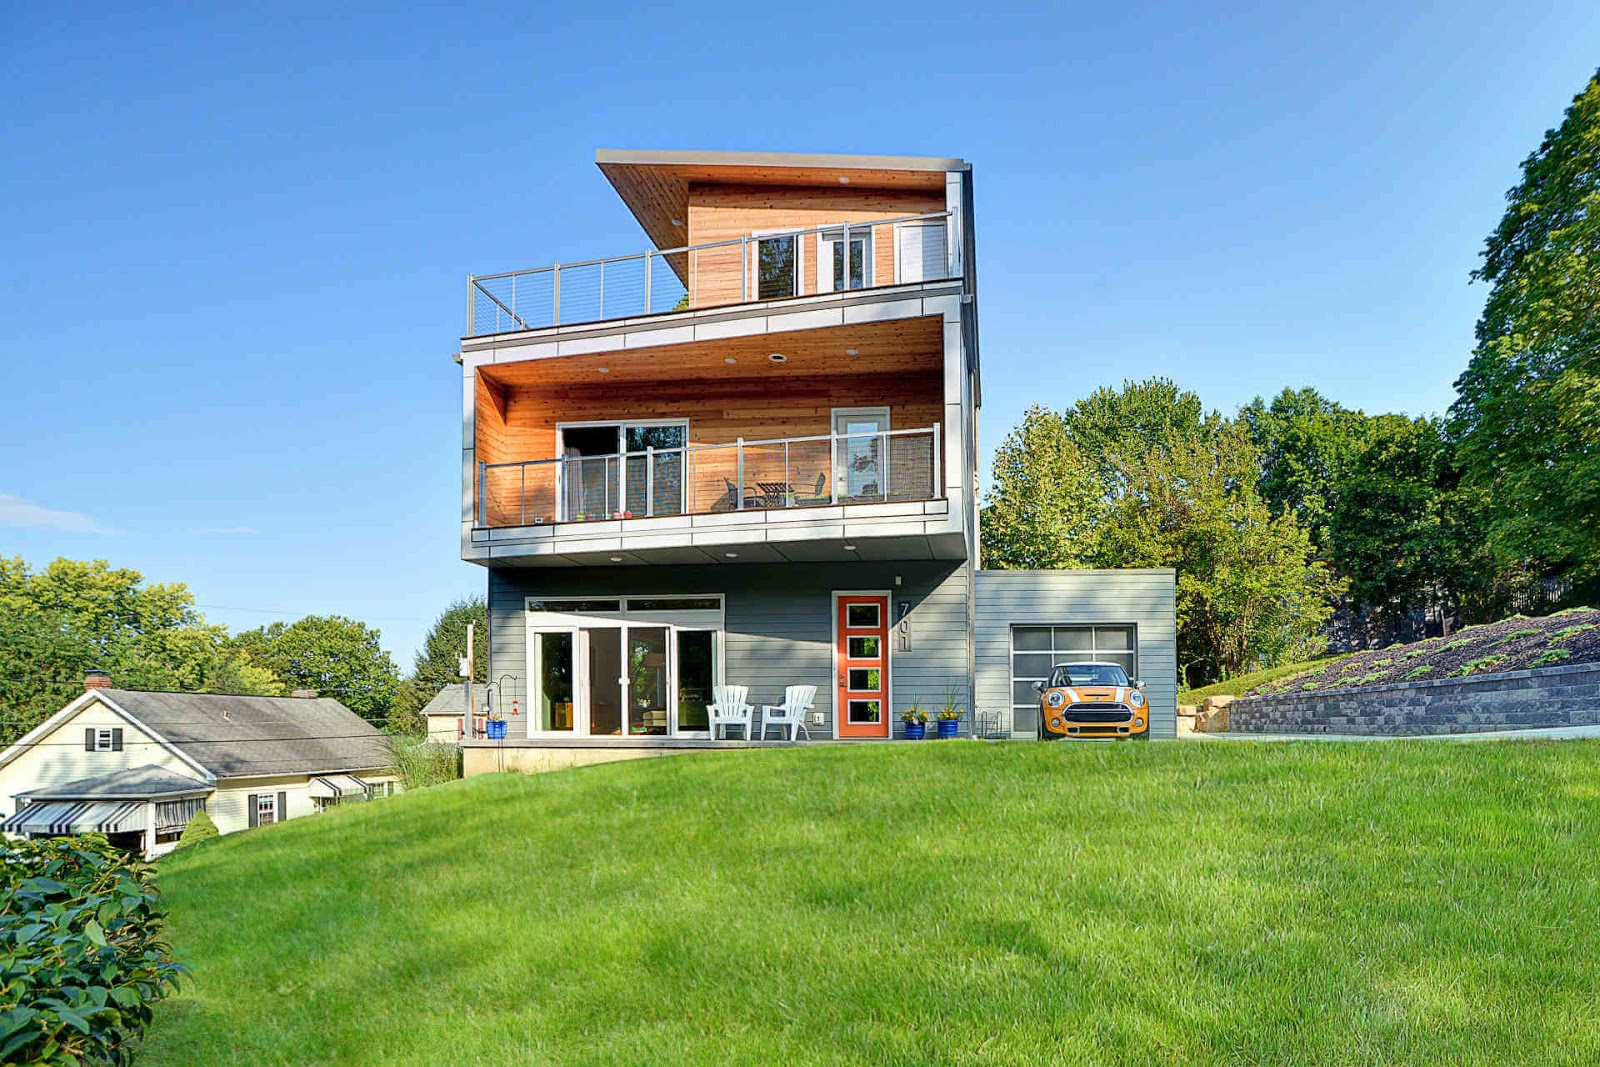 Modular Homes Strattanville Pa